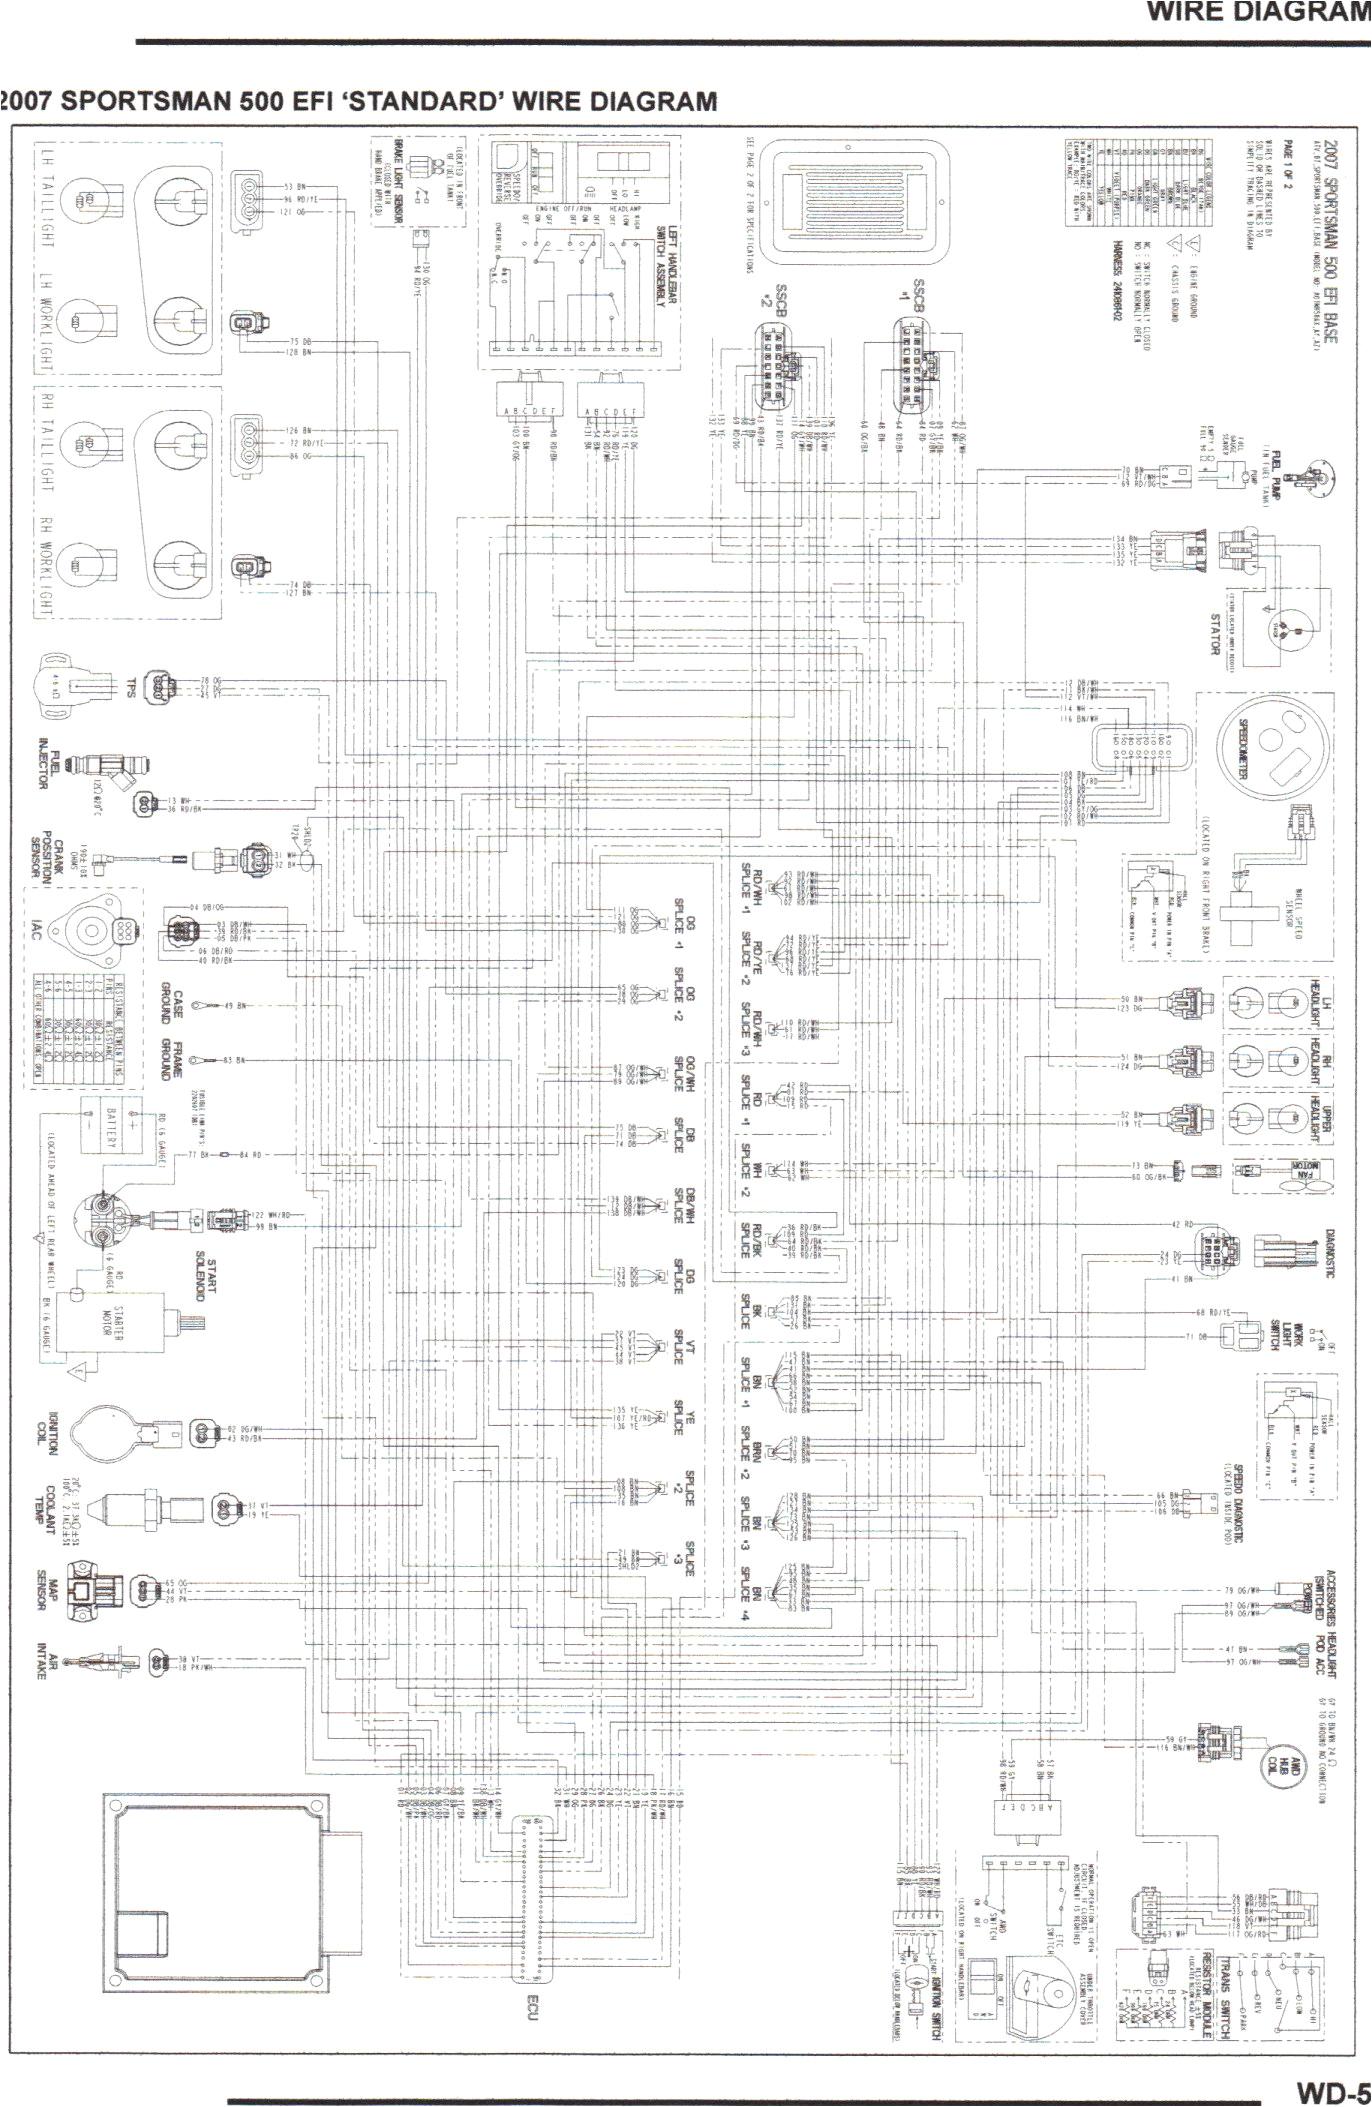 2004 polaris sportsman 400 wiring diagram polaris magnum 500 wiring diagram diagrams schematics simple 2004 rh bjzhjy net 2004 polaris sportsman 90 wiring diagram 2004 polaris sportsman 90 w jpg